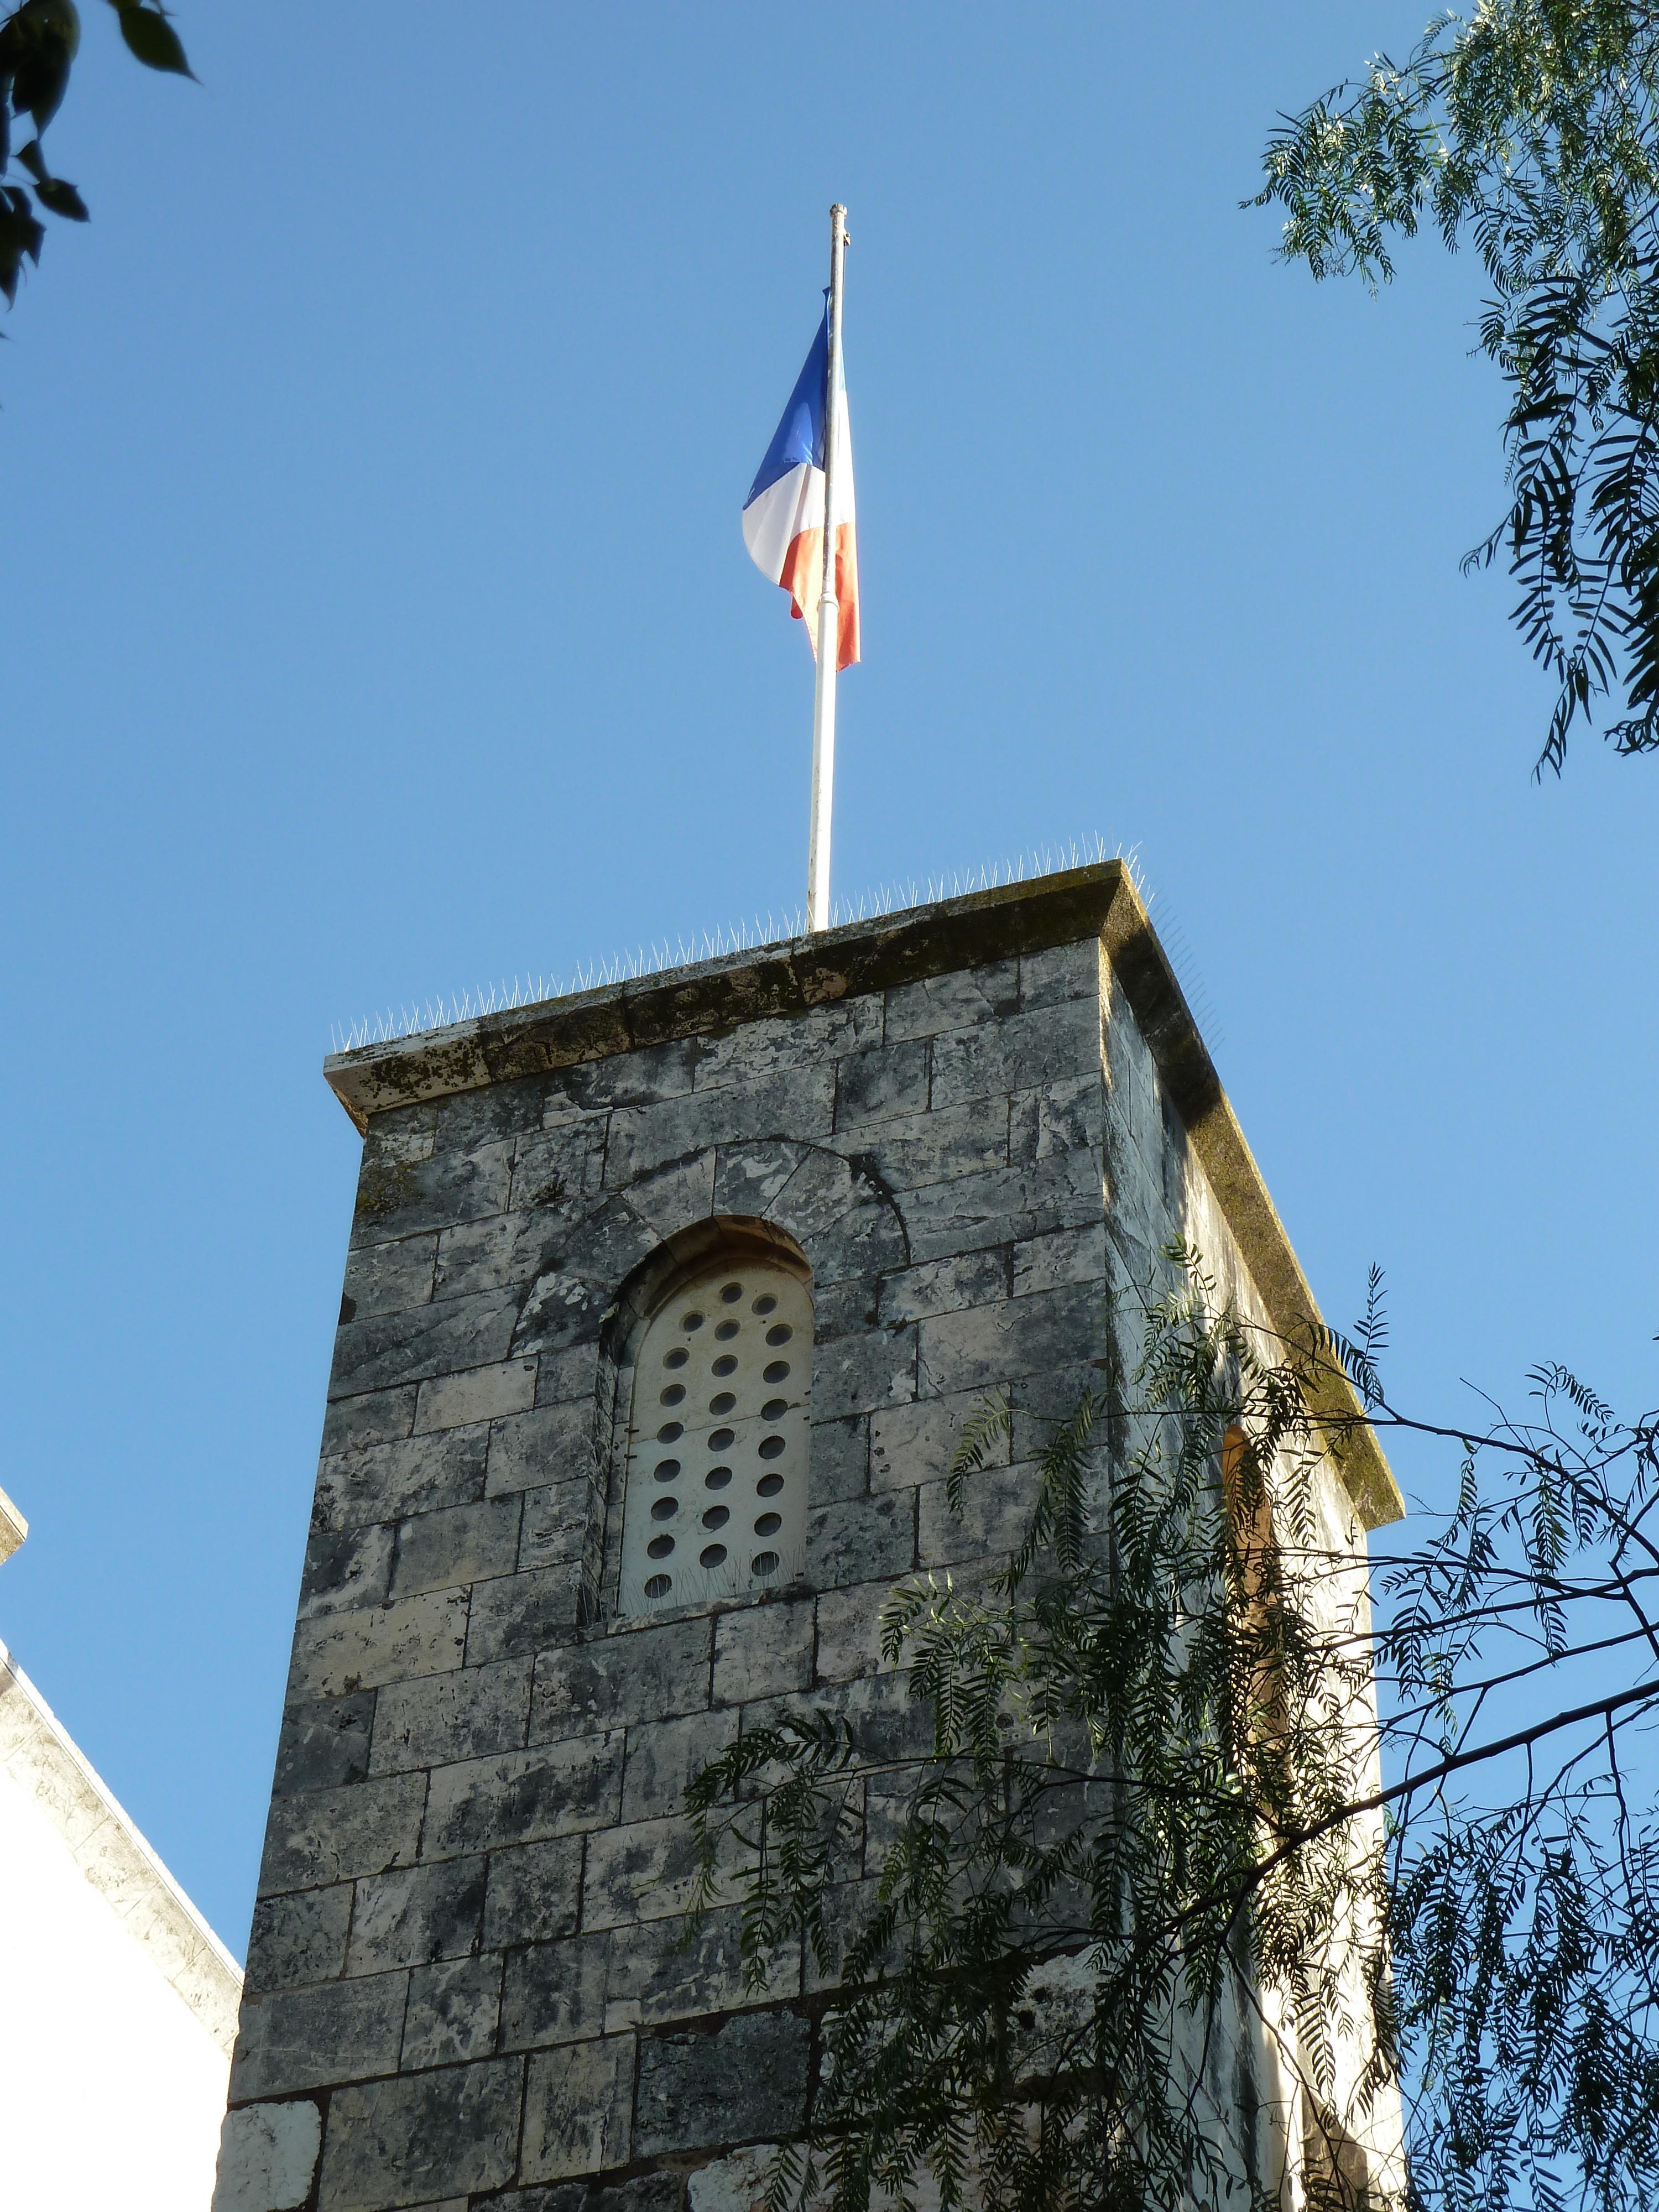 https://i1.wp.com/upload.wikimedia.org/wikipedia/commons/b/b3/Old_Jerusalem_Saint-Anne_church_french_flag.jpg